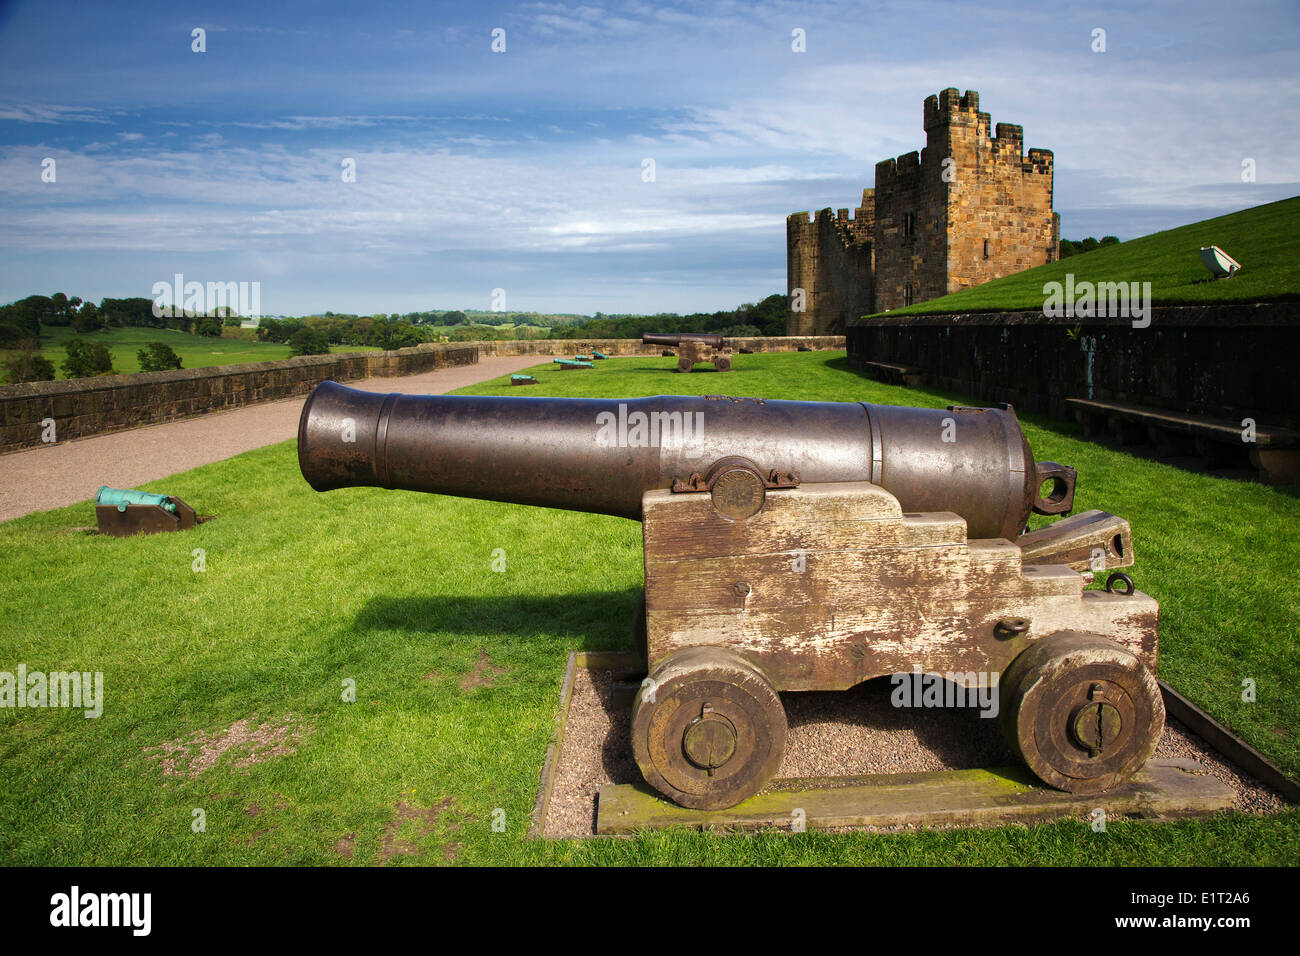 Canon in the gun terrace at Alnwick Castle, where Harry Potter was filmed - Stock Image